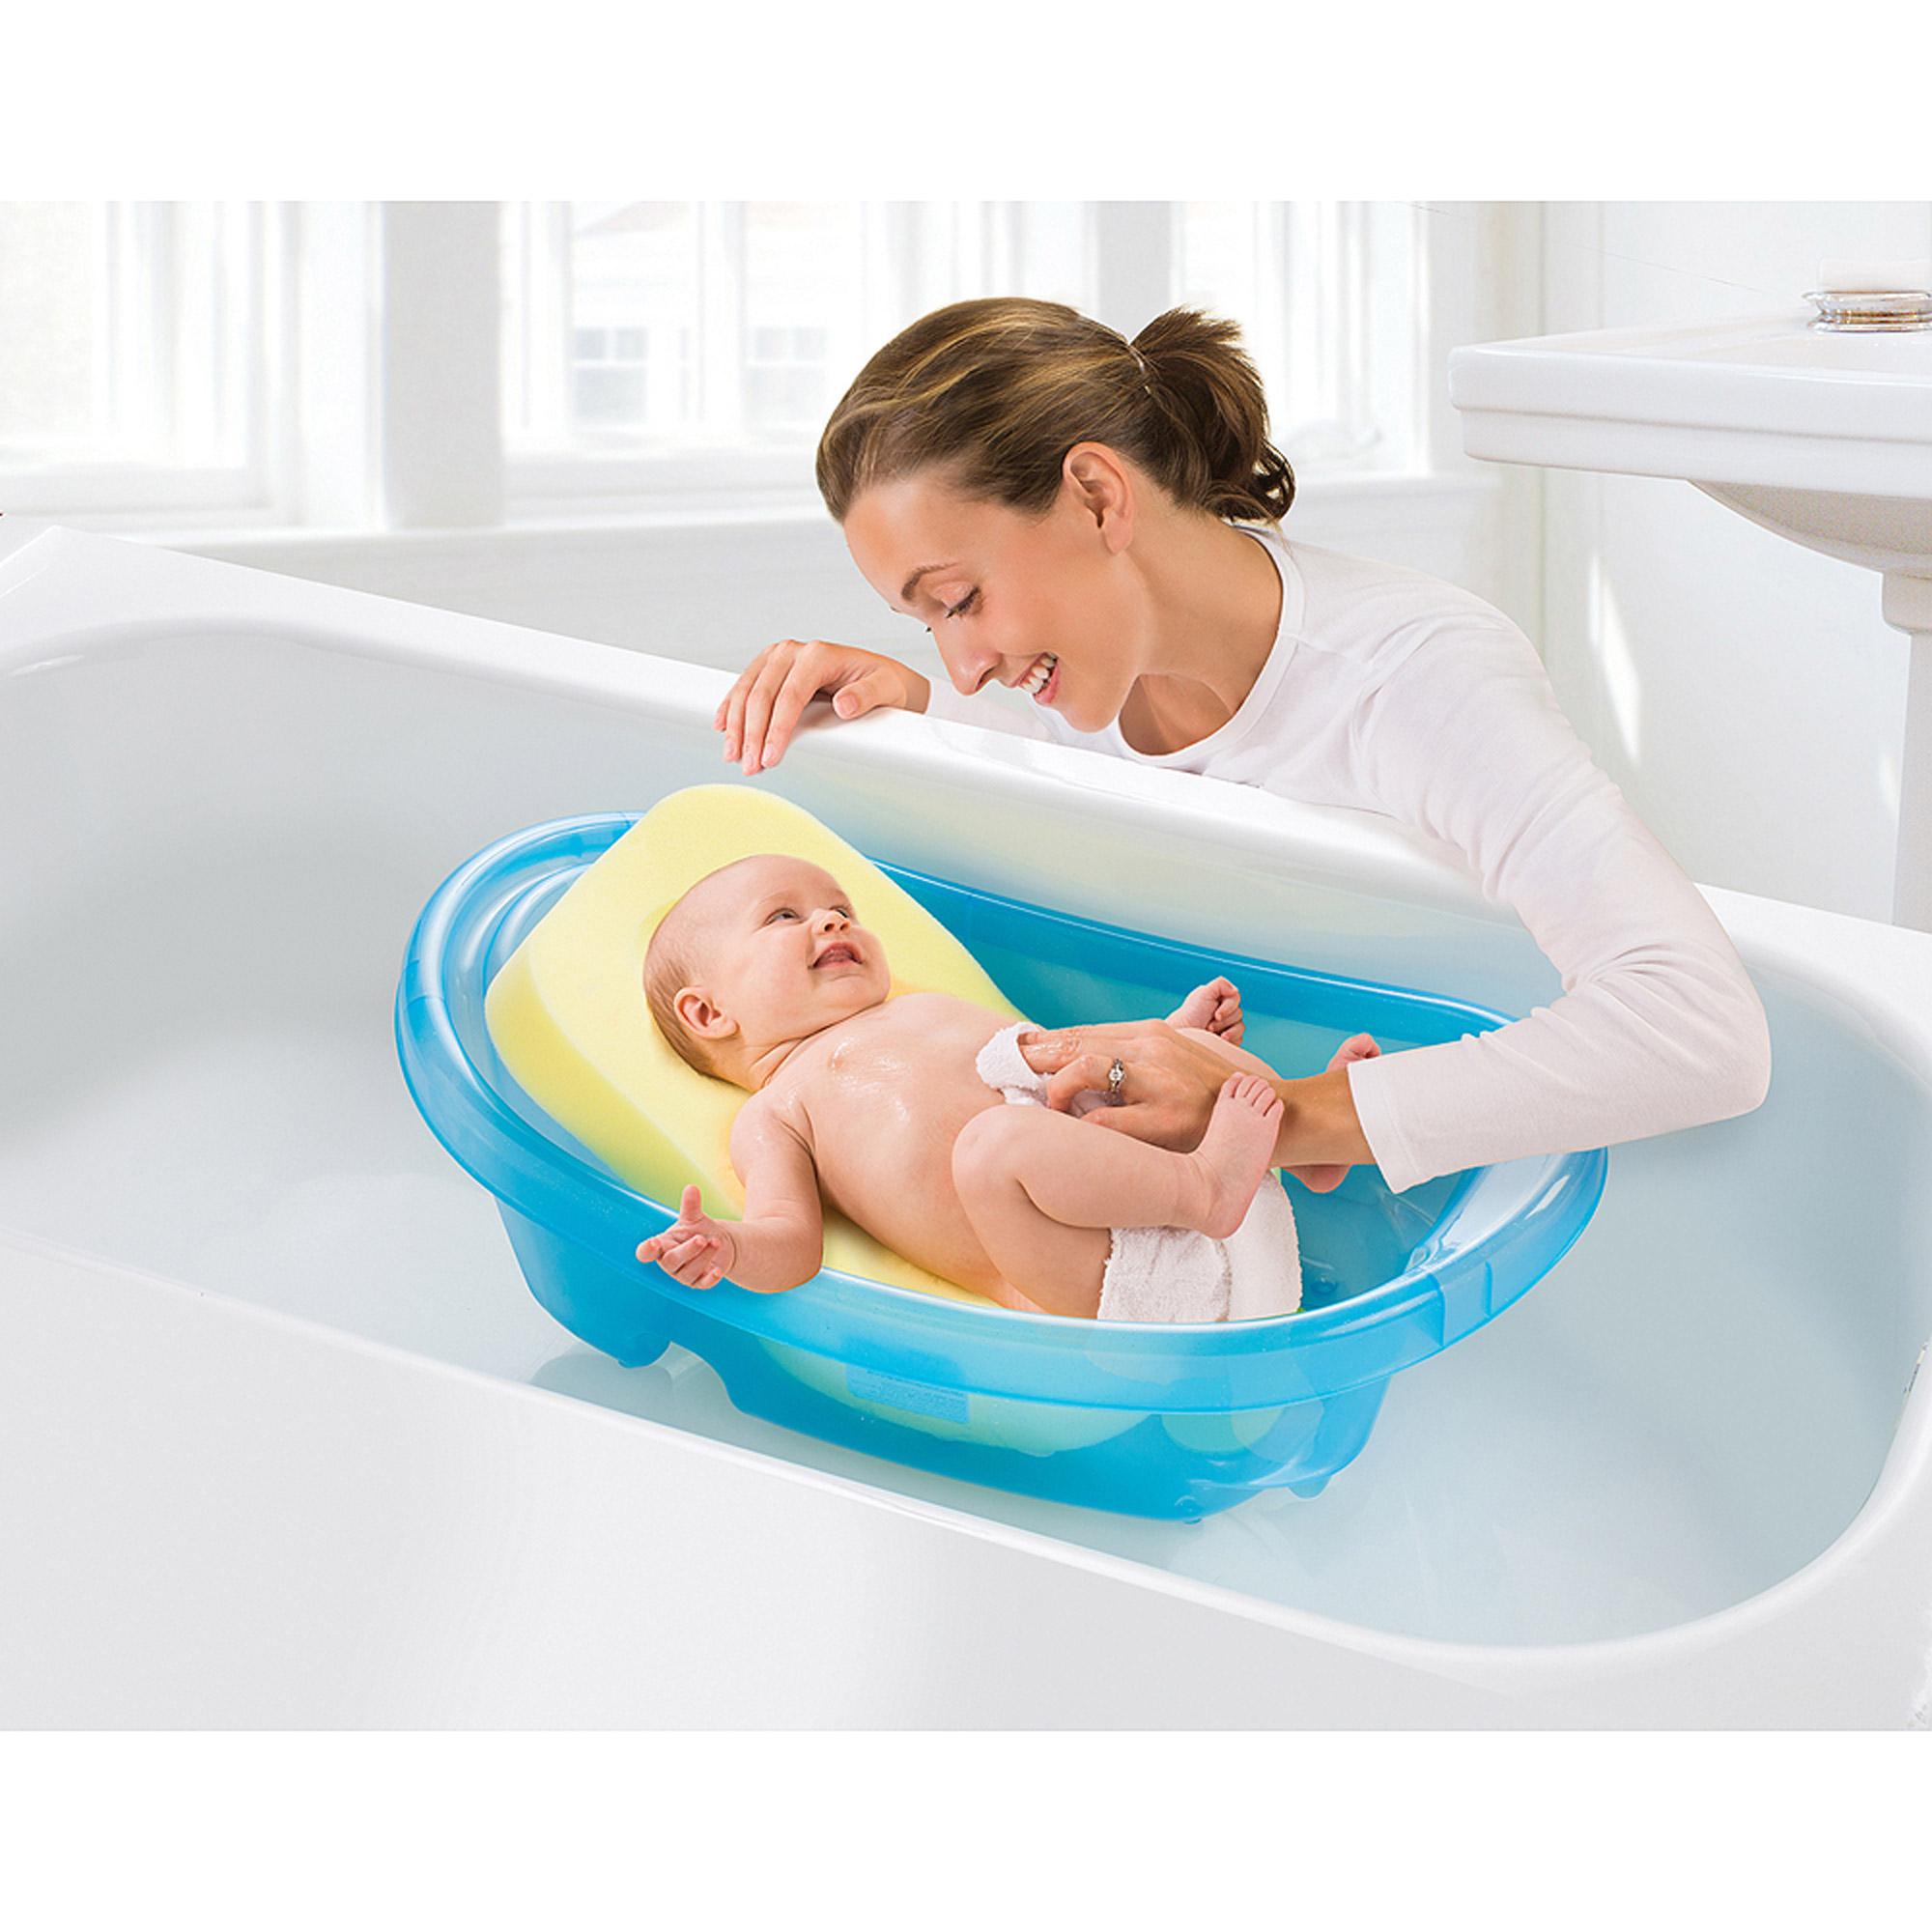 Summer Infant Comfy Bath Sponge - Walmart.com